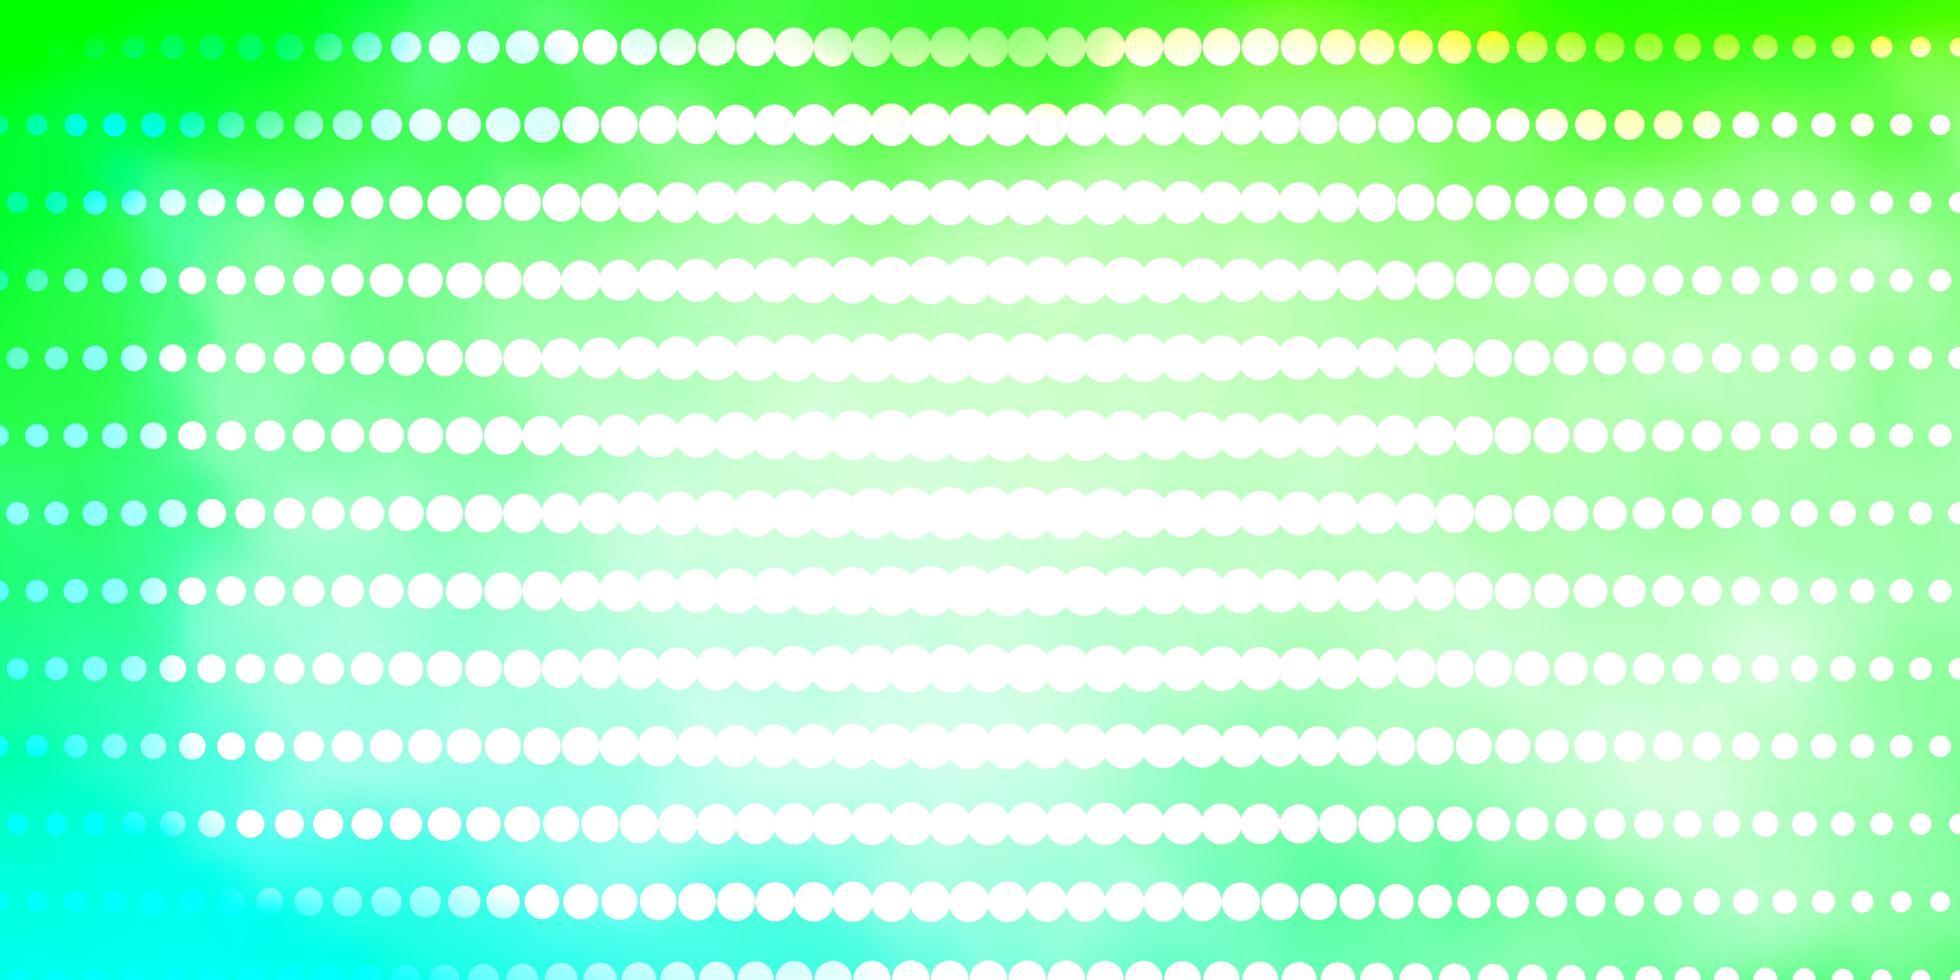 lichtgroene vectorlay-out met cirkels. vector